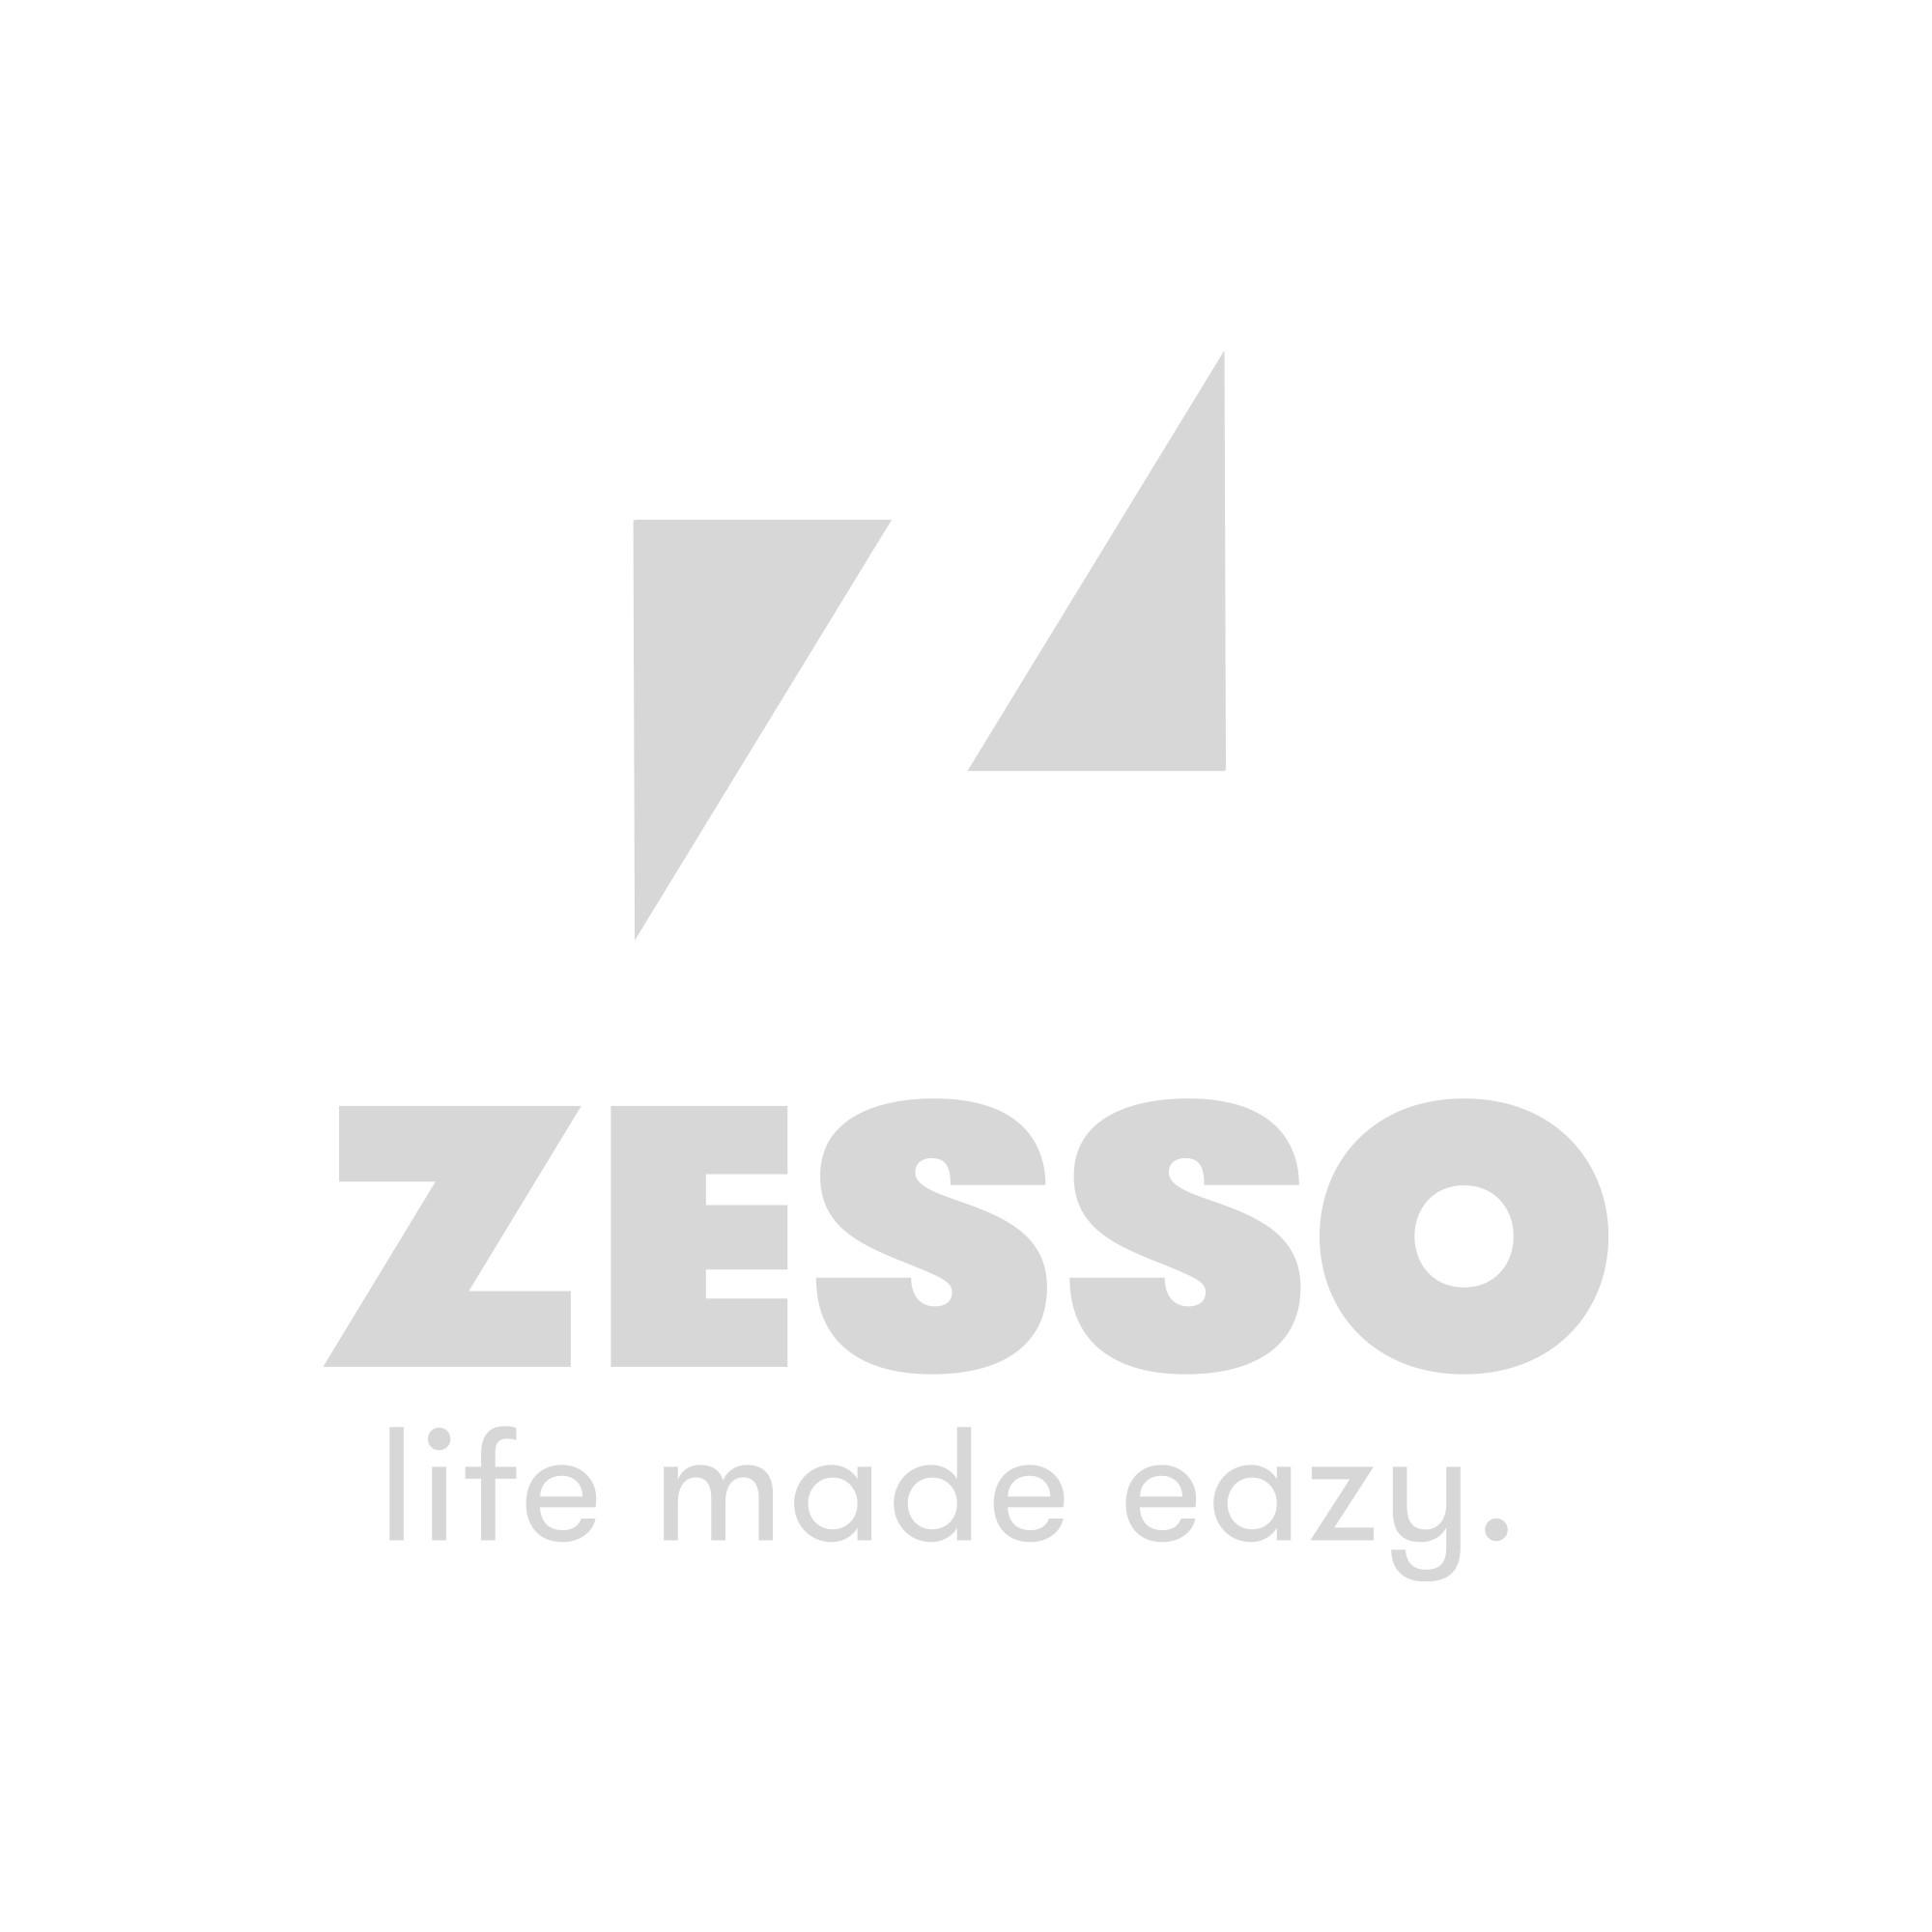 Jollein Wiegdeken Fancy Knit Blush Pink - 75 cm x 100 cm